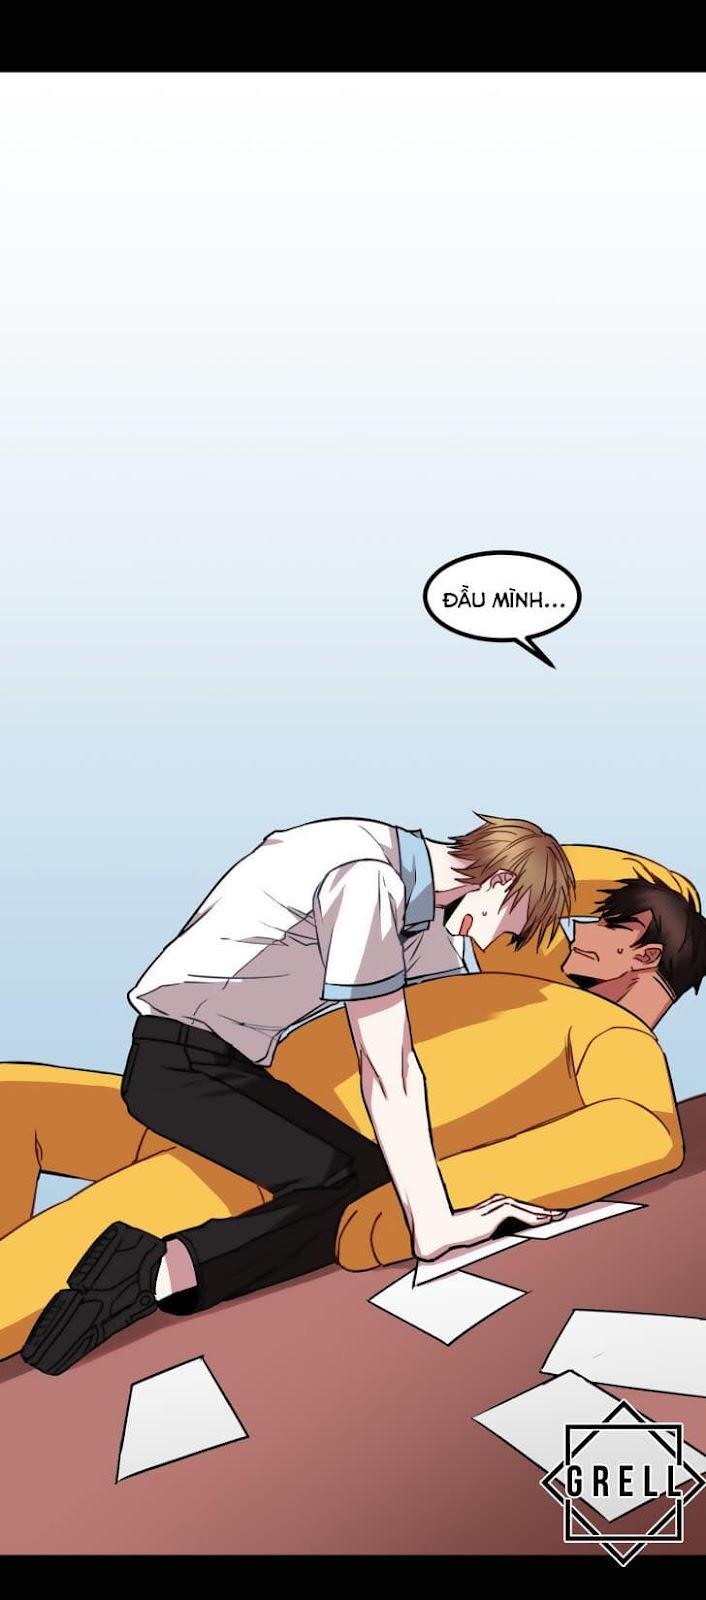 Trang 40 - [ Manhwa ] Trái tim thầm lặng - Heart Silent - Chap 002 (- Han Kyeul) - Truyện tranh Gay - Server HostedOnGoogleServerStaging